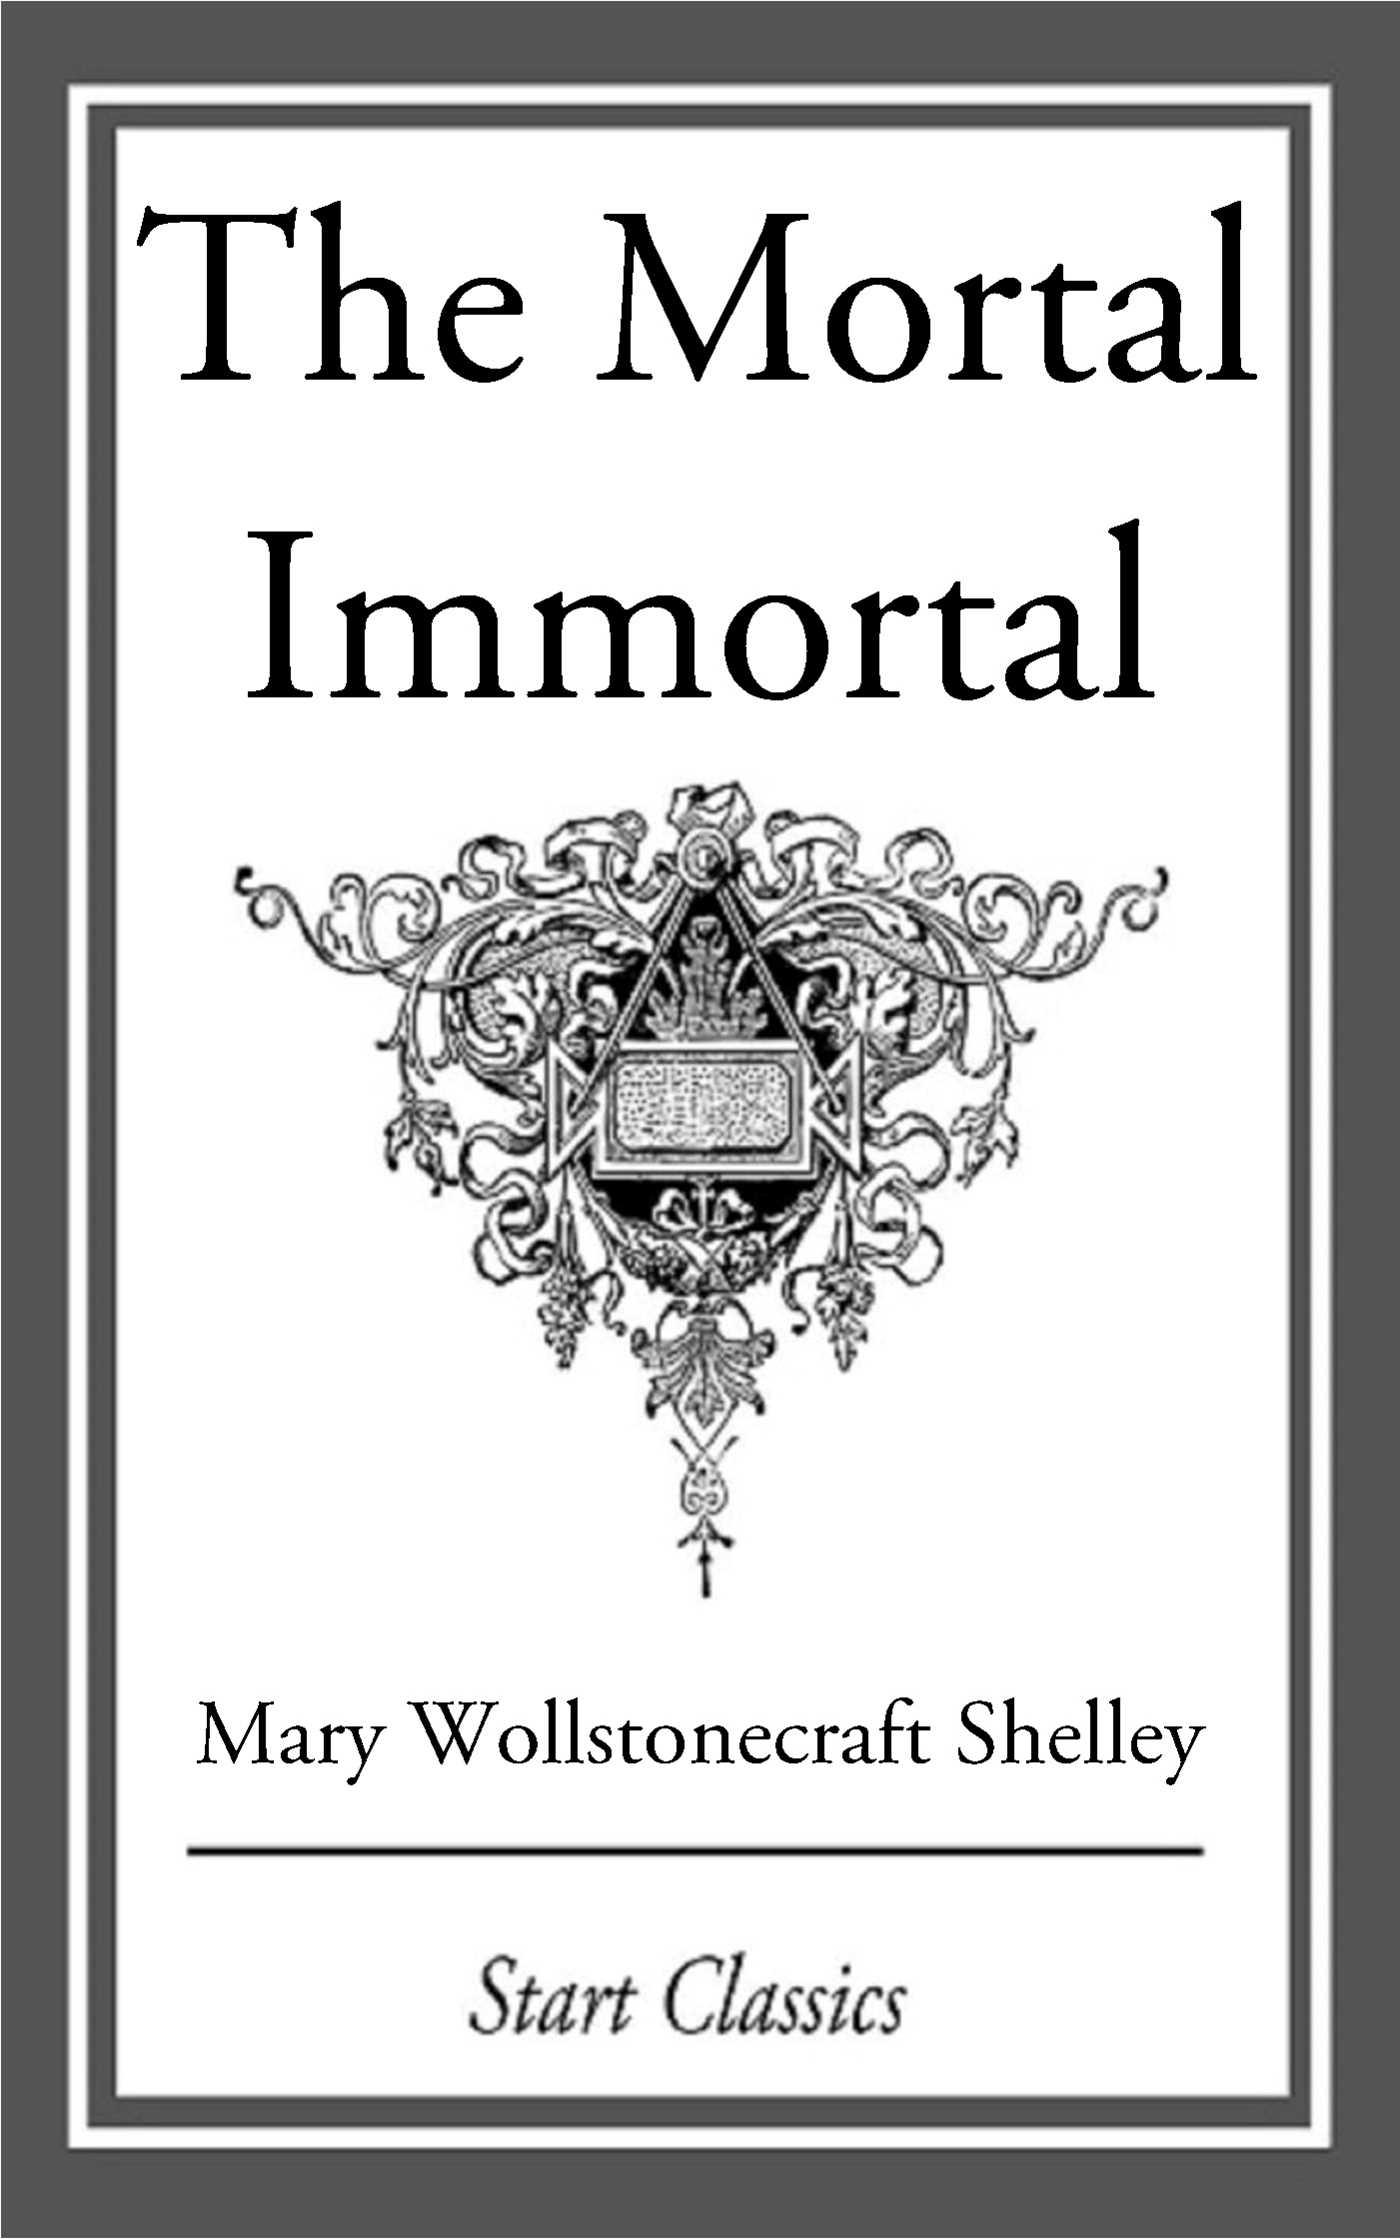 The Mortal Immortal eBook by Mary Wollstonecraft Shelley